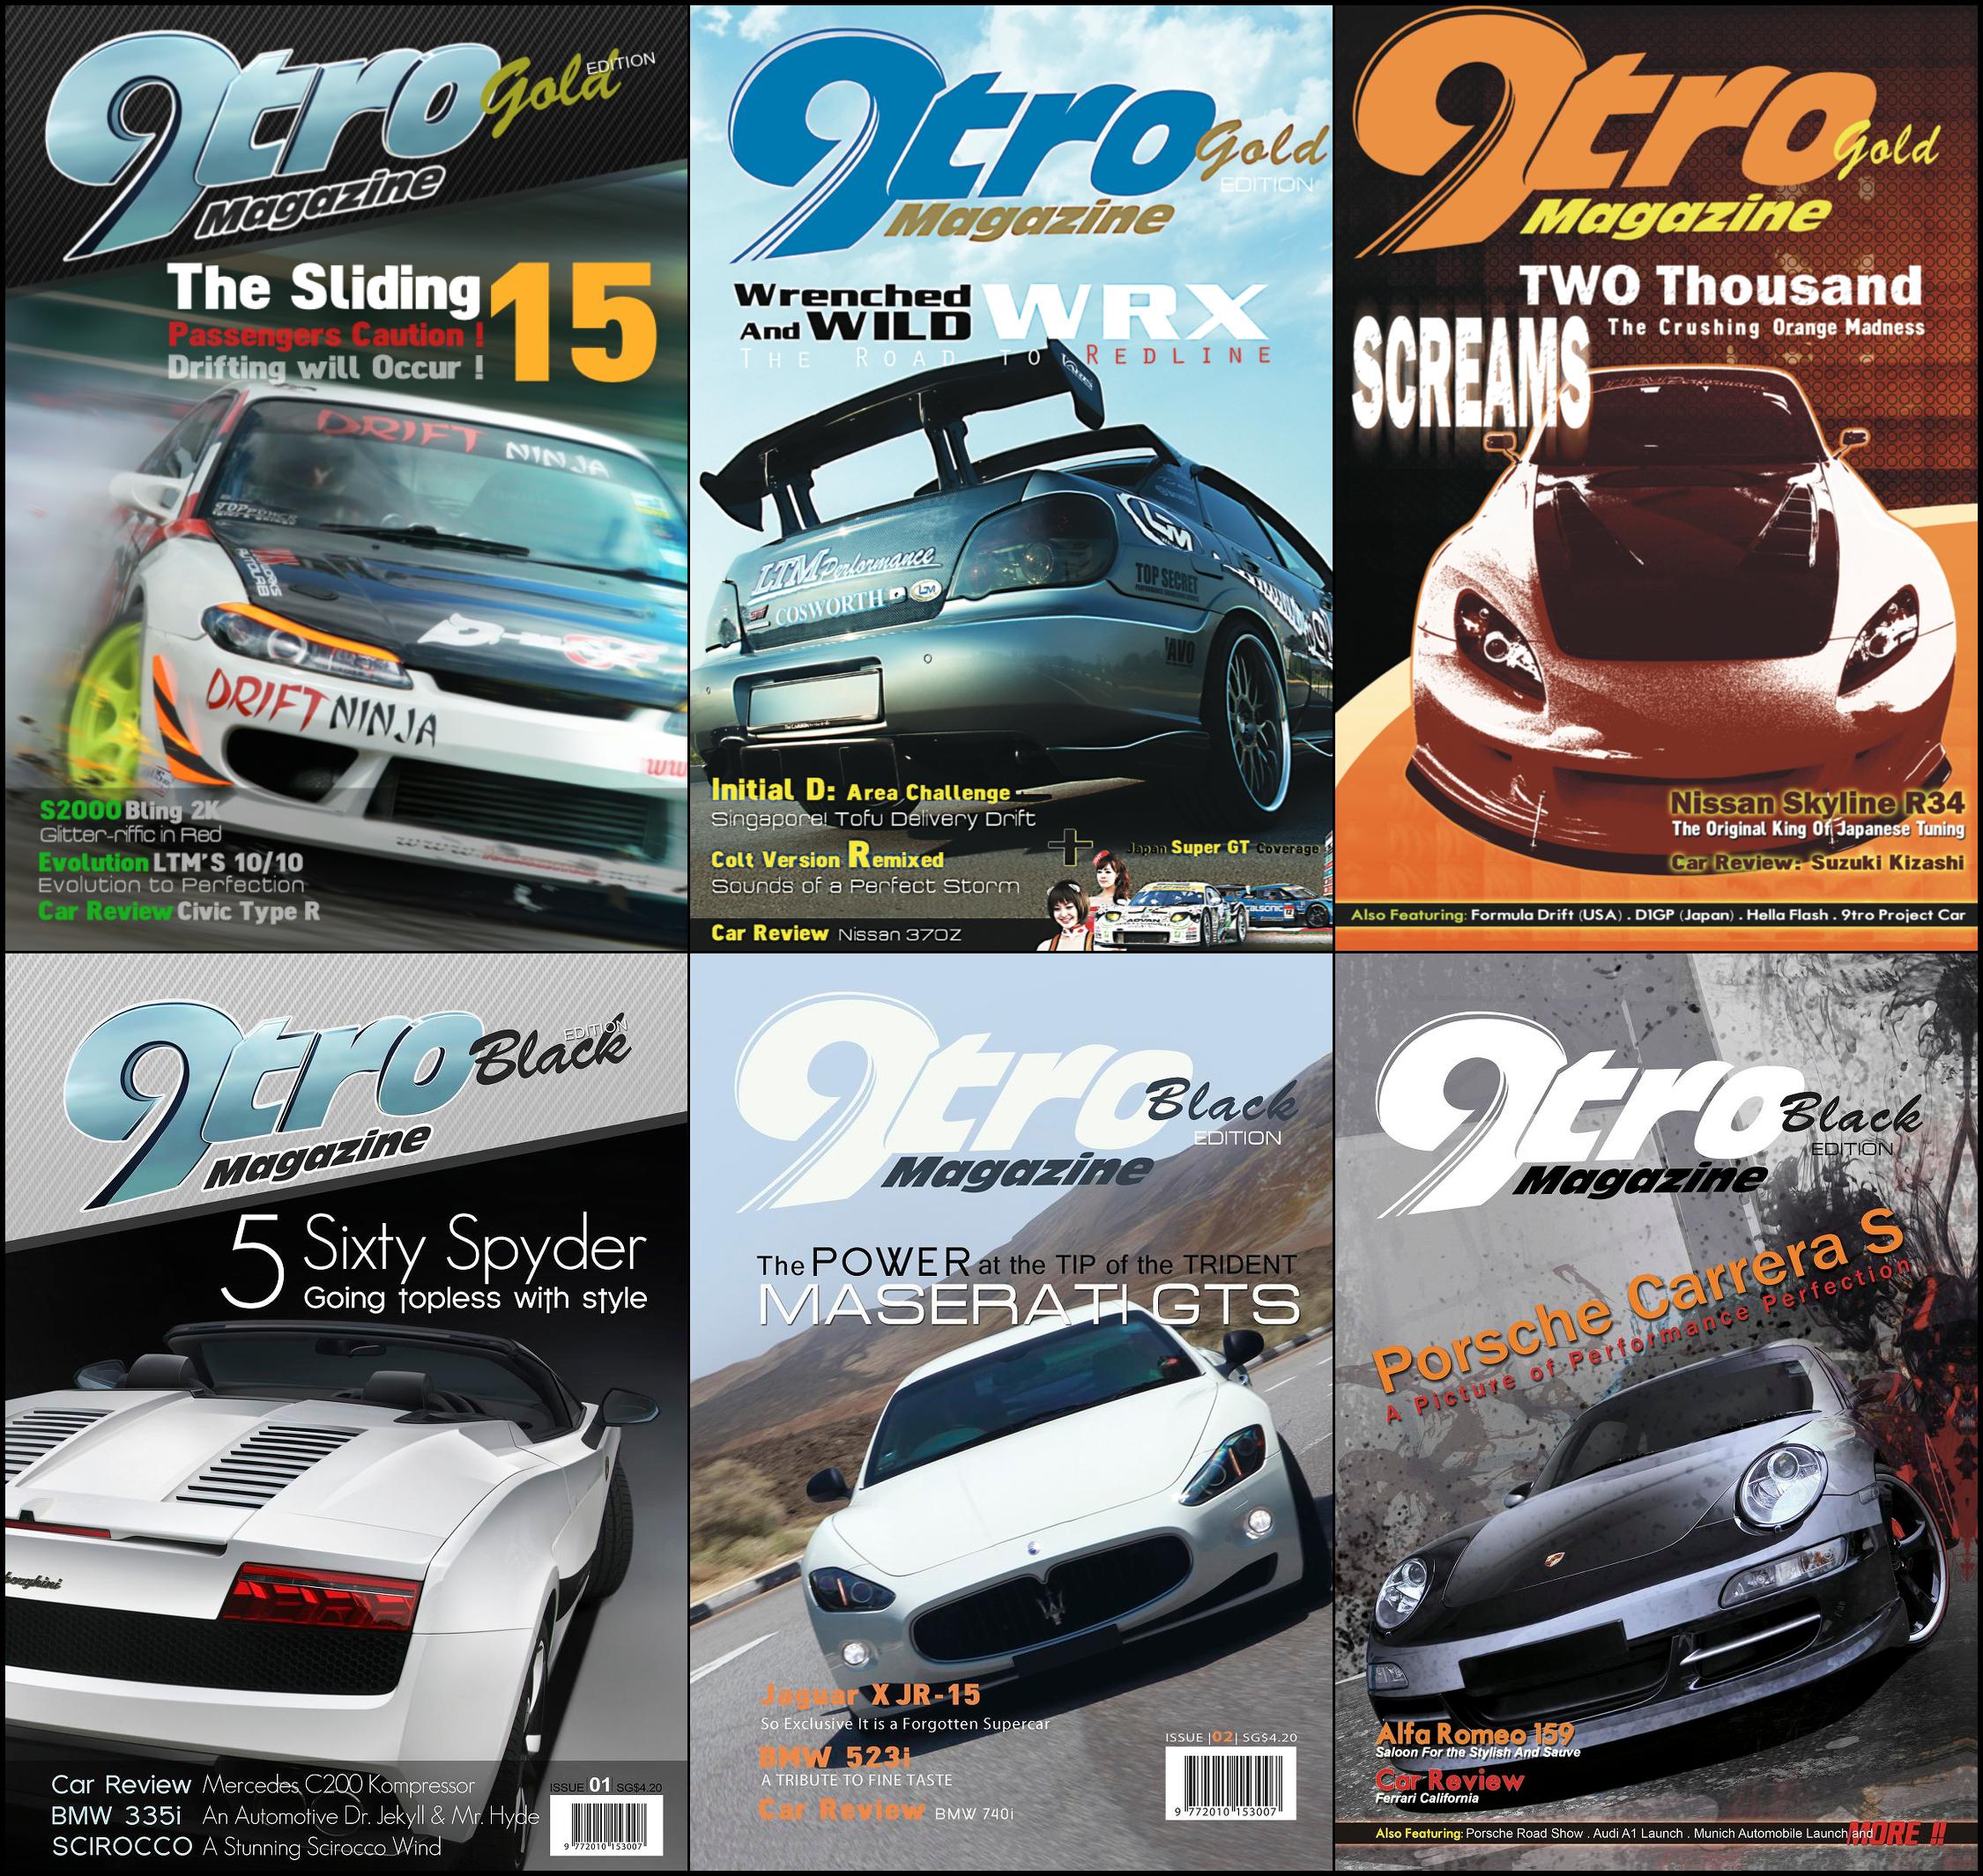 9tro Magazine Cover 3.jpg